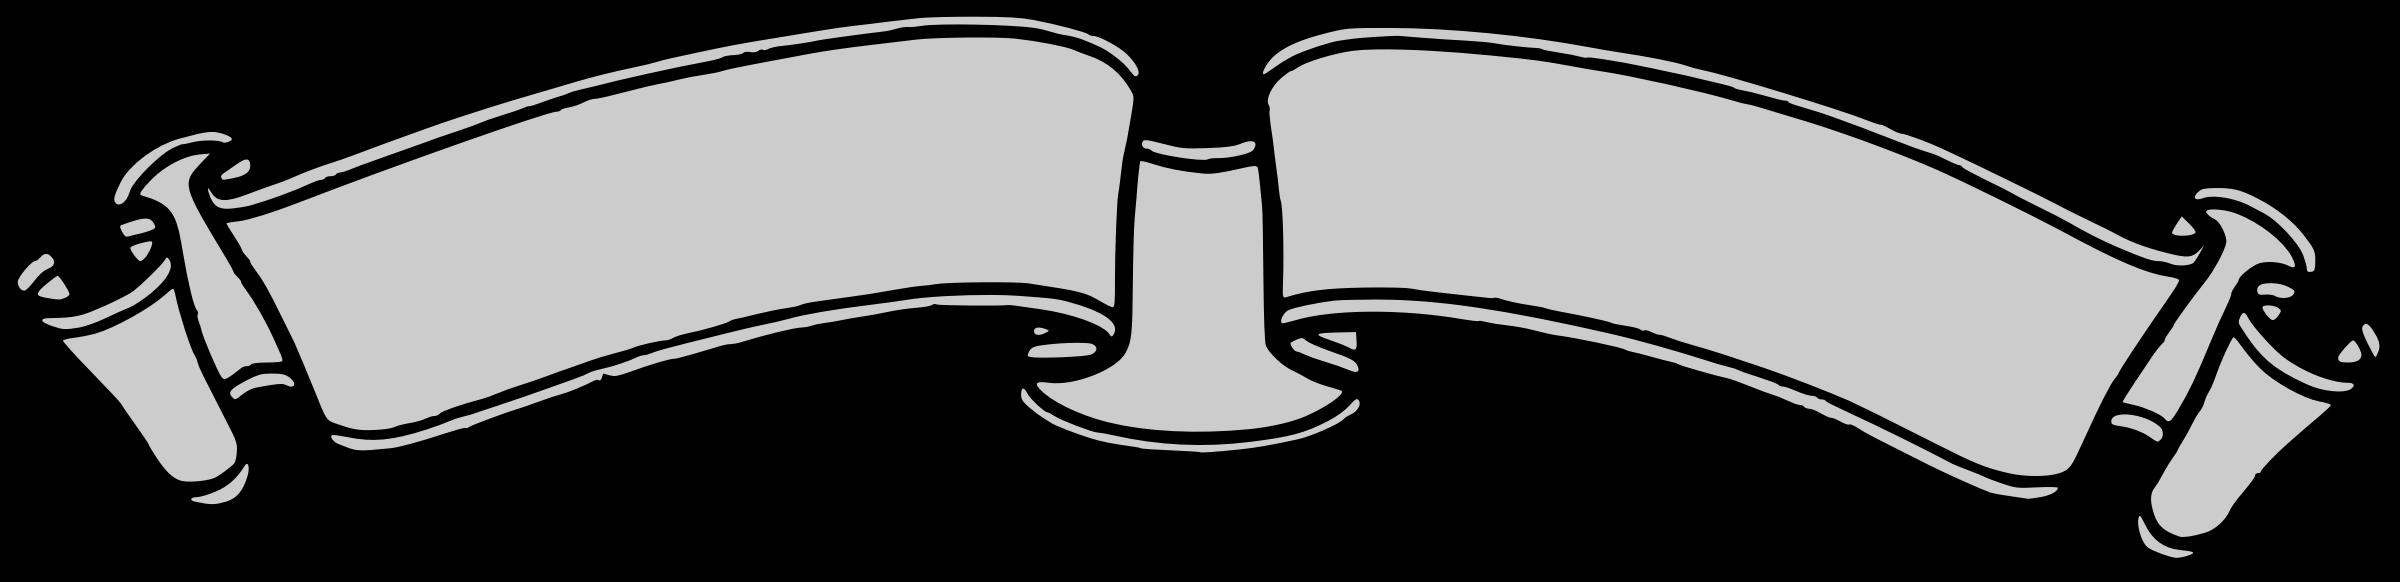 Banner clip art ribbon. Clipart big image png